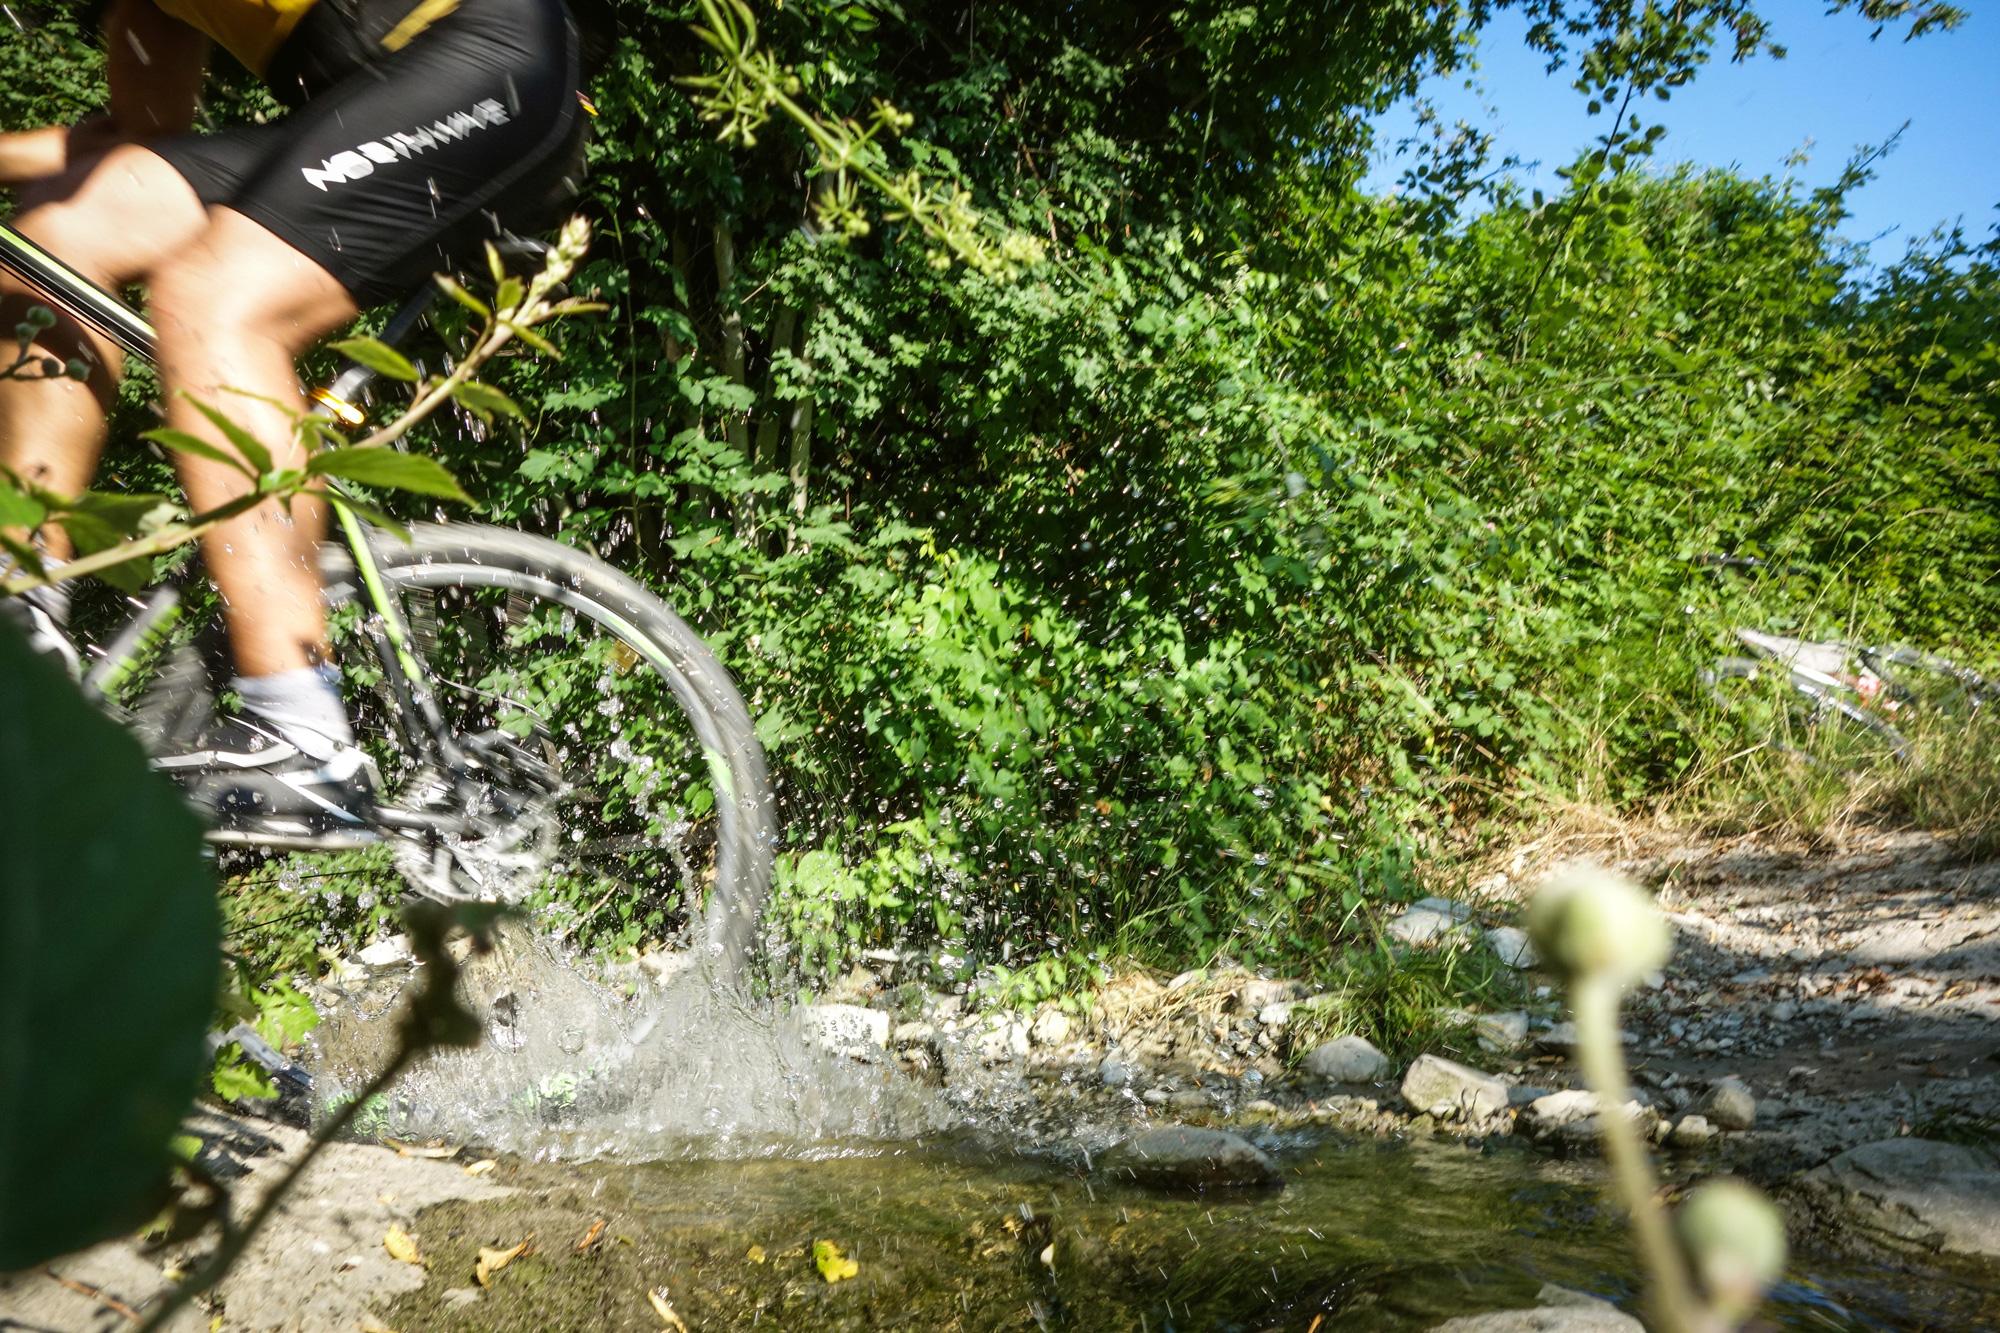 zocca_mtb_ride_appennino_modenese_erman_bike_dimondi-11